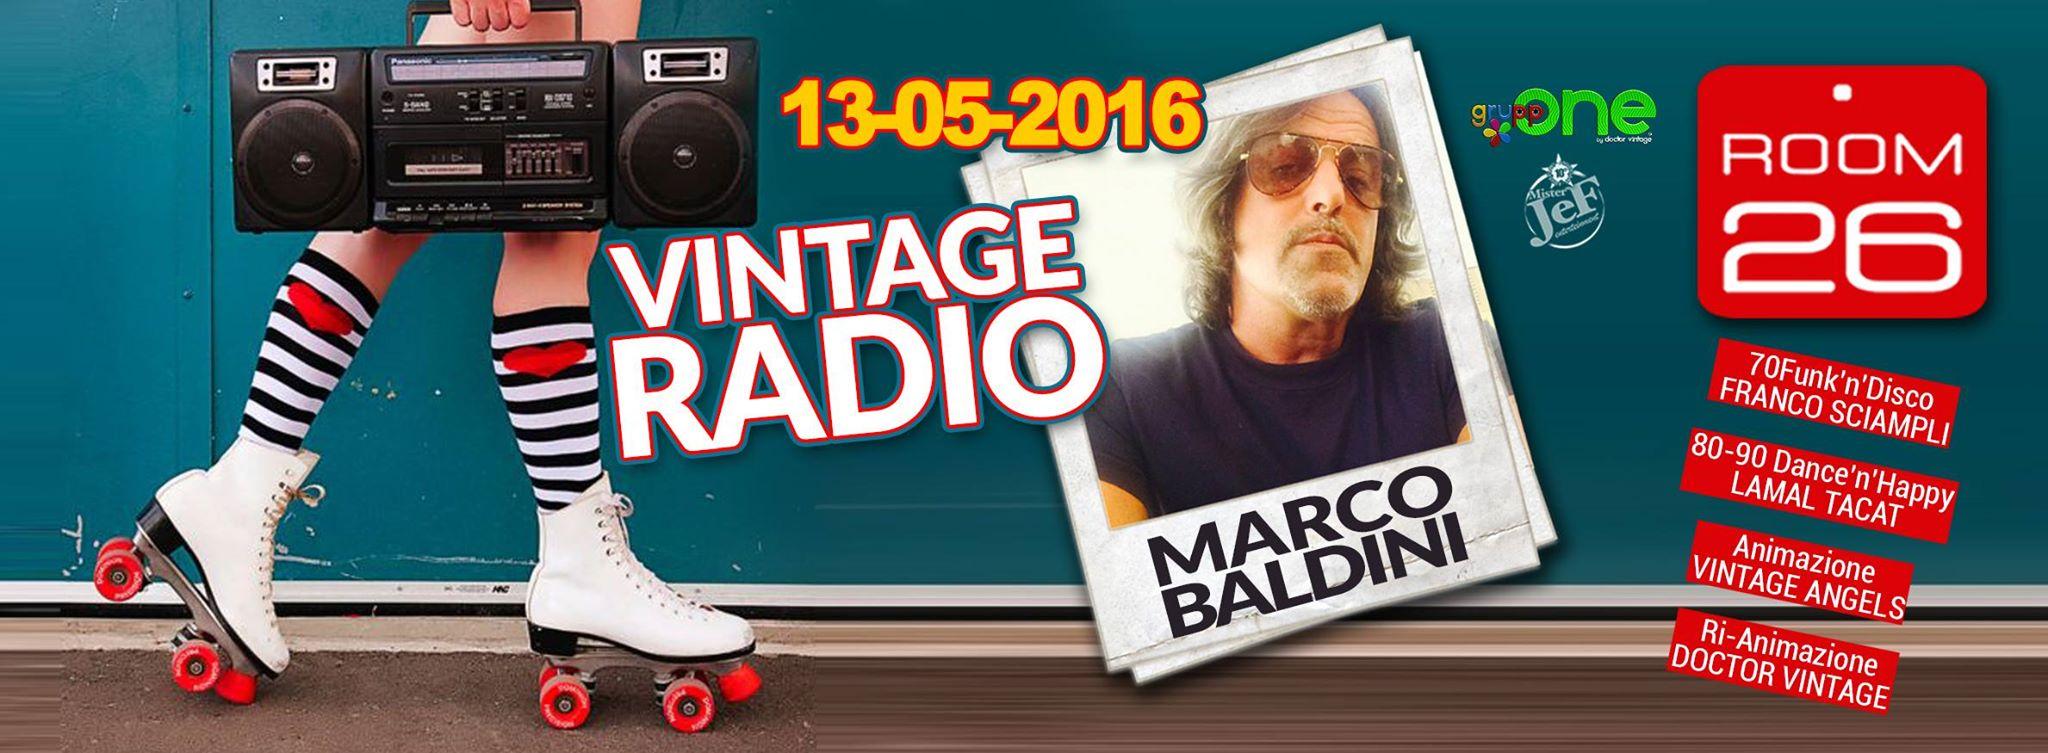 ROOM 26 DISCOTECA ROMA VENERDÌ 11 MARZO 2016 – HERO MARCO BALDINI